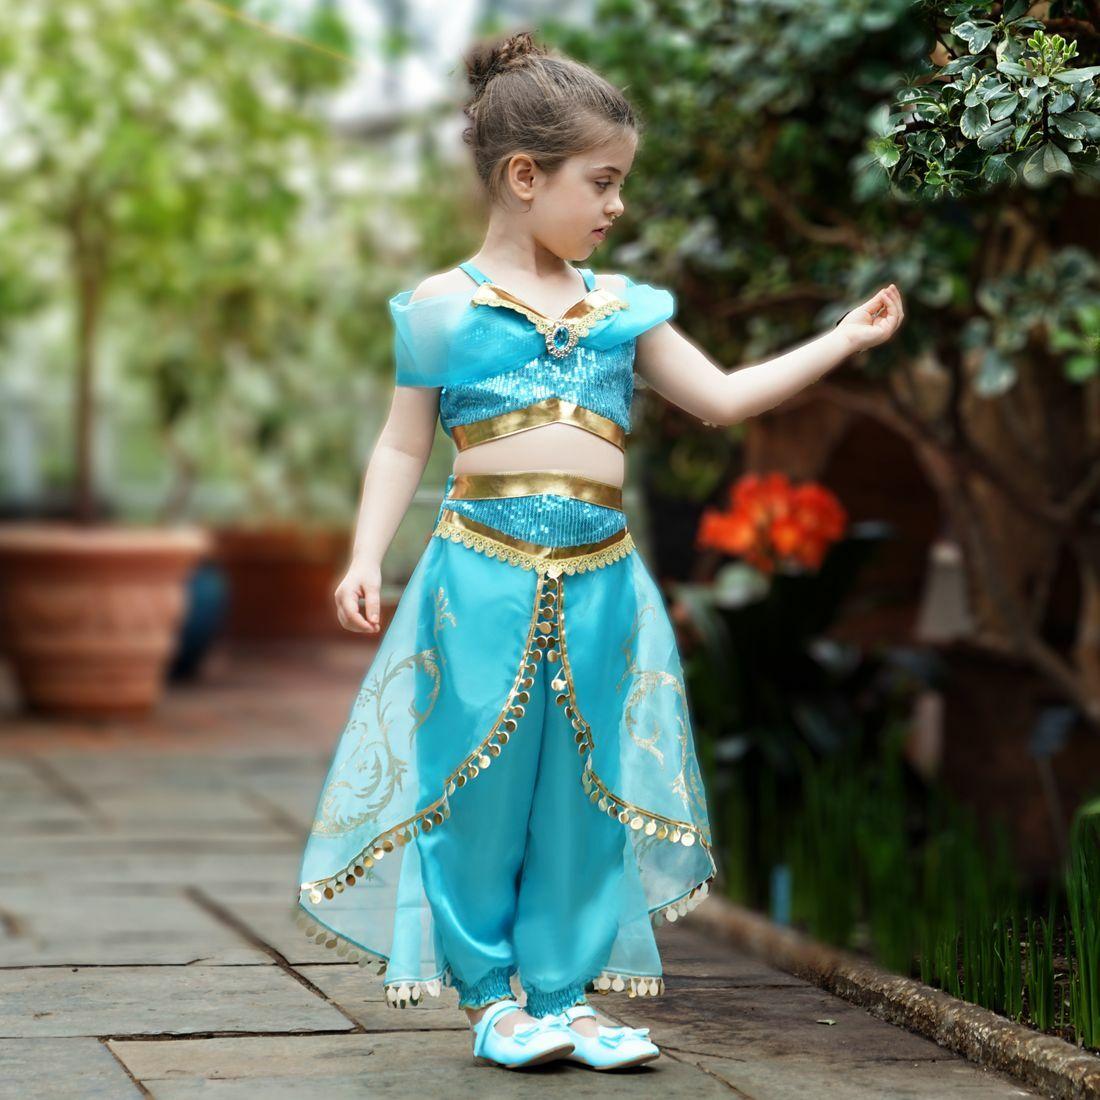 Girl in a two-piece blue Arabian princess costume